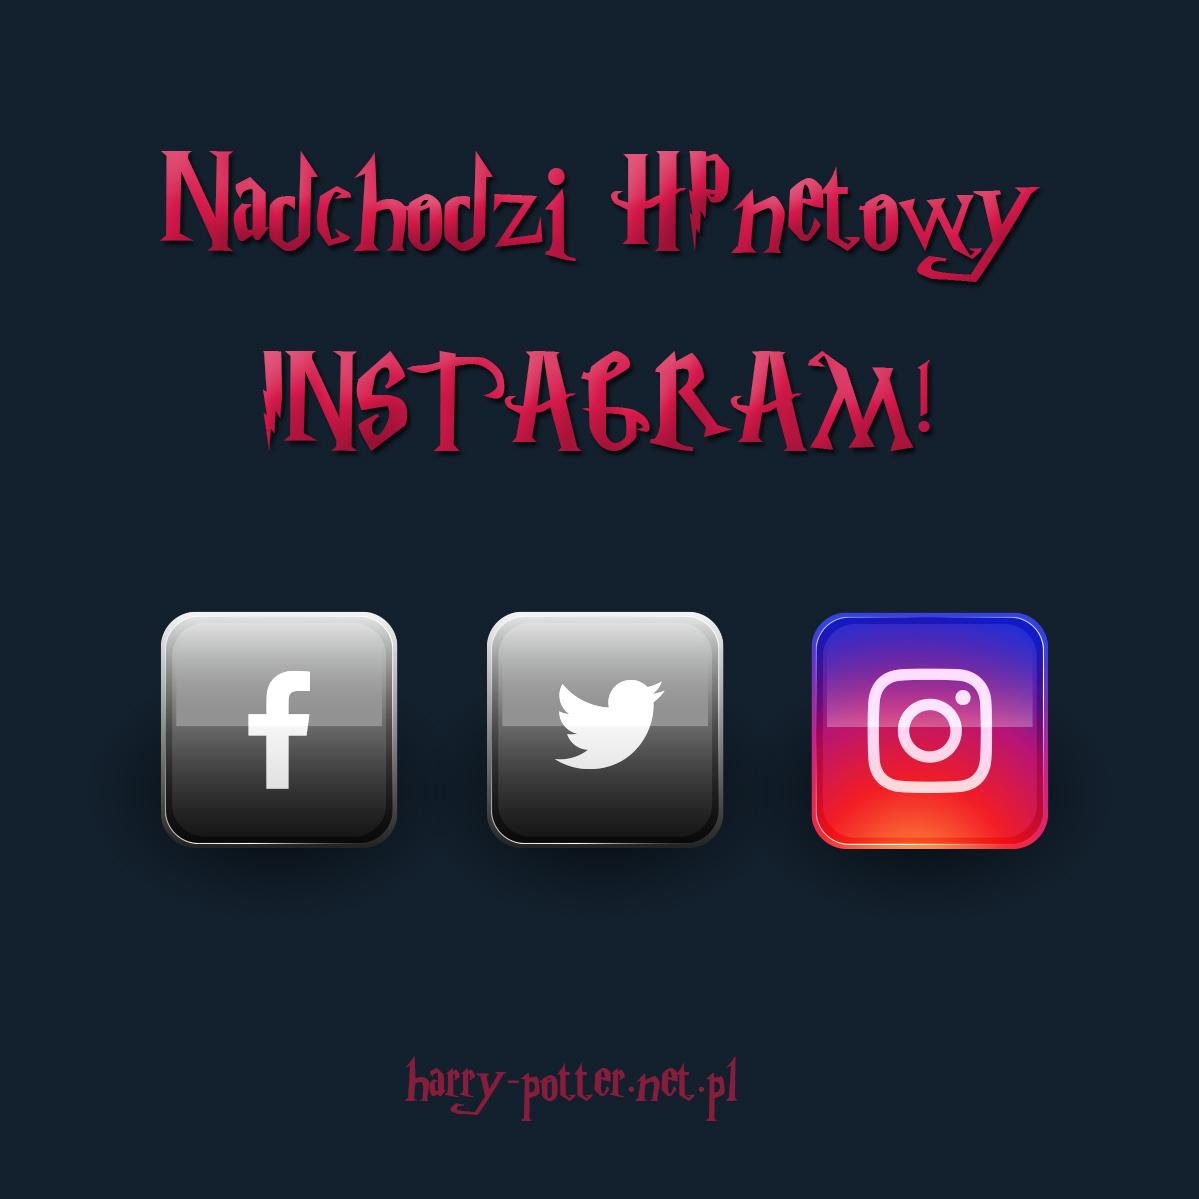 http://www.harry-potter.net.pl/images/news/nabor_instagram.jpg style=